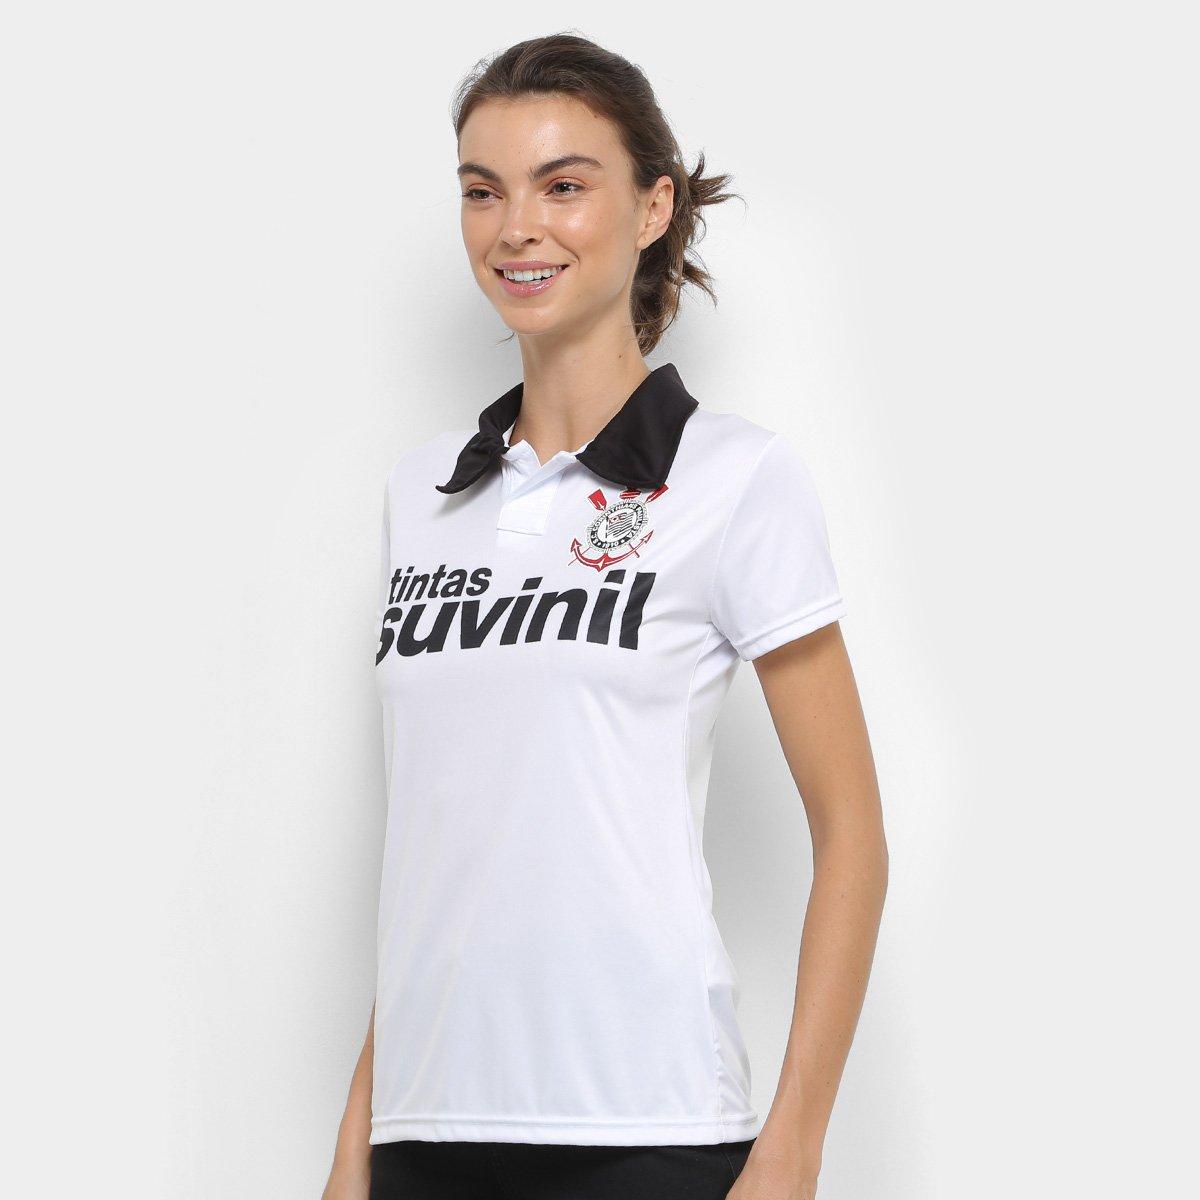 Camisa Polo Corinthians 1995 n° 9 Feminina - Branco e Preto - Compre ... 482d11b2cbf0e